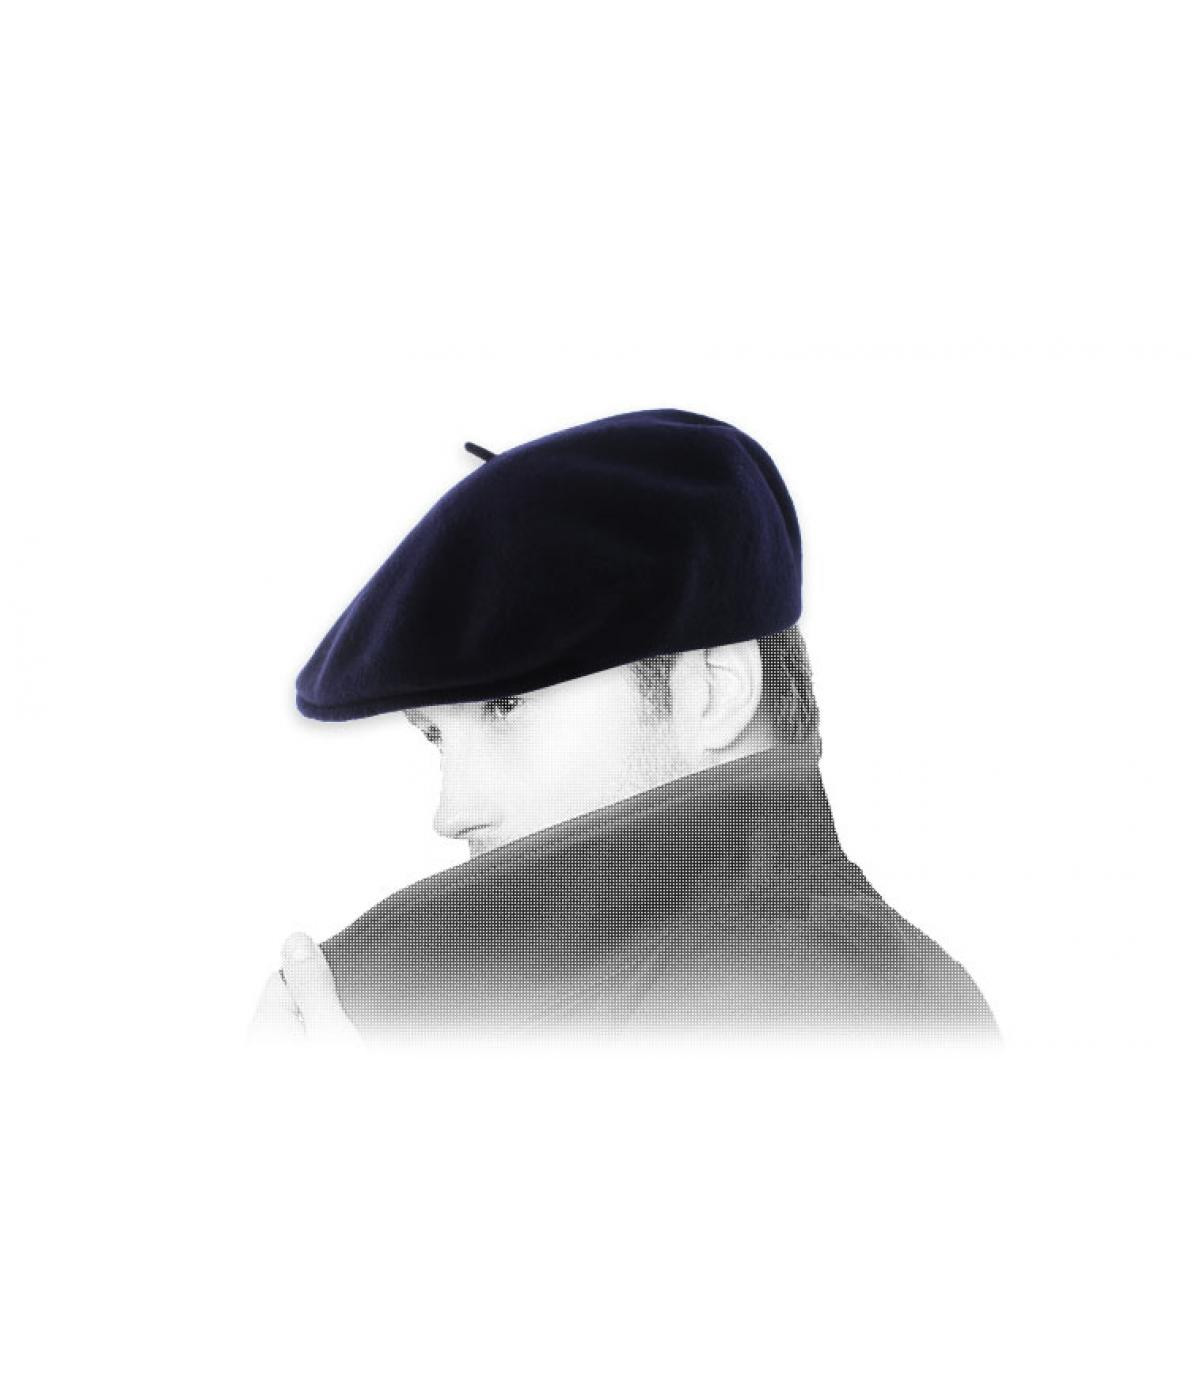 eendenbek marine Beret Laulhère